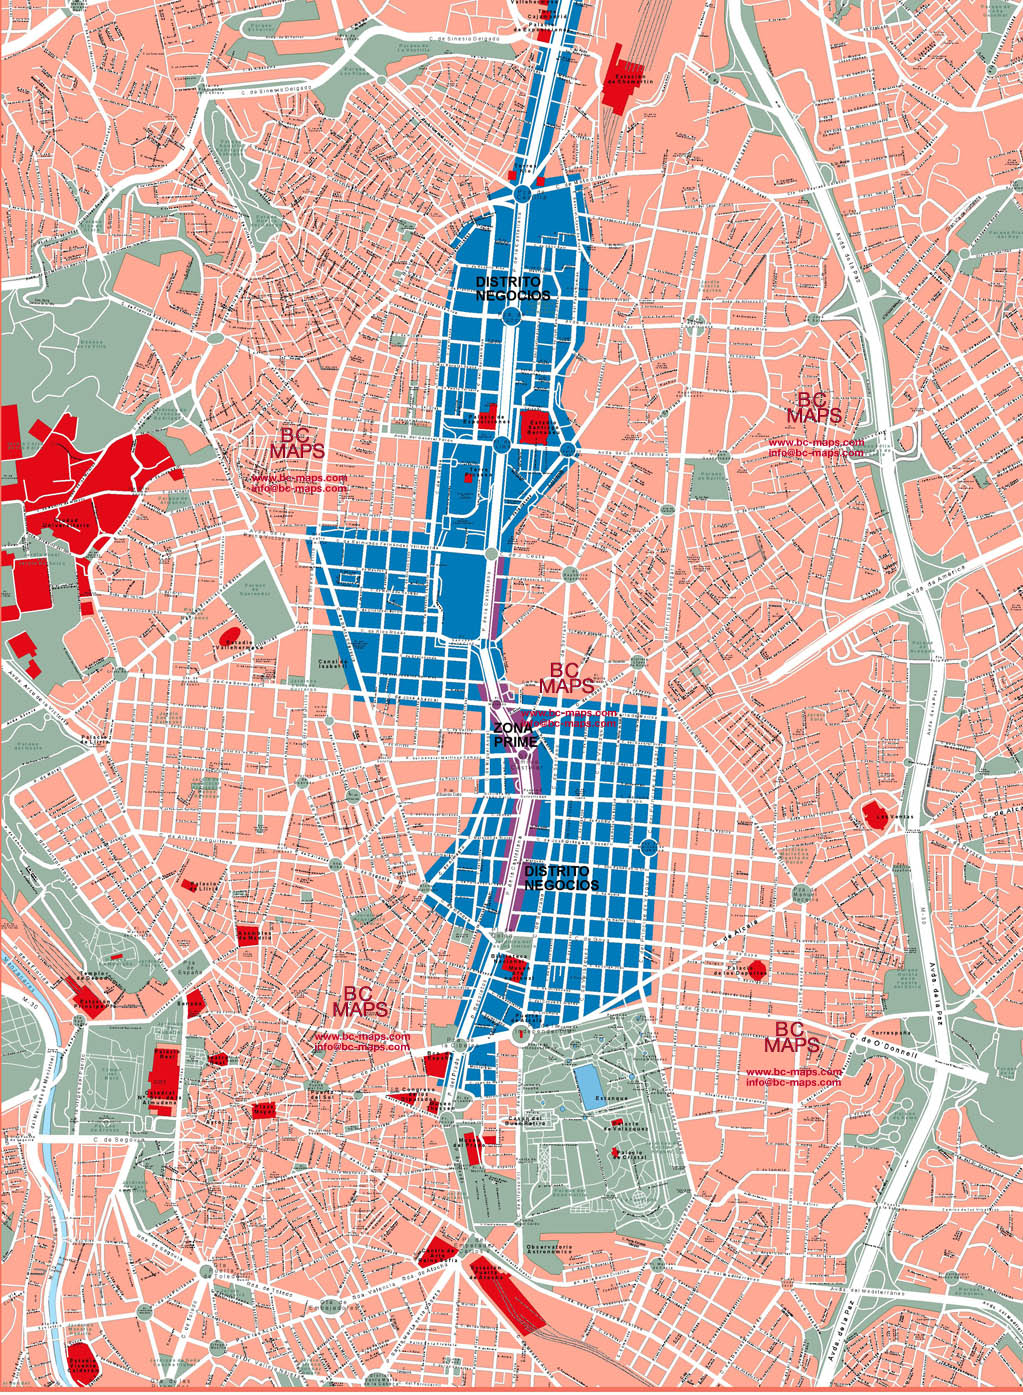 Madrid - Vector city maps, eps, illustrator, freehand, Corel draw ...